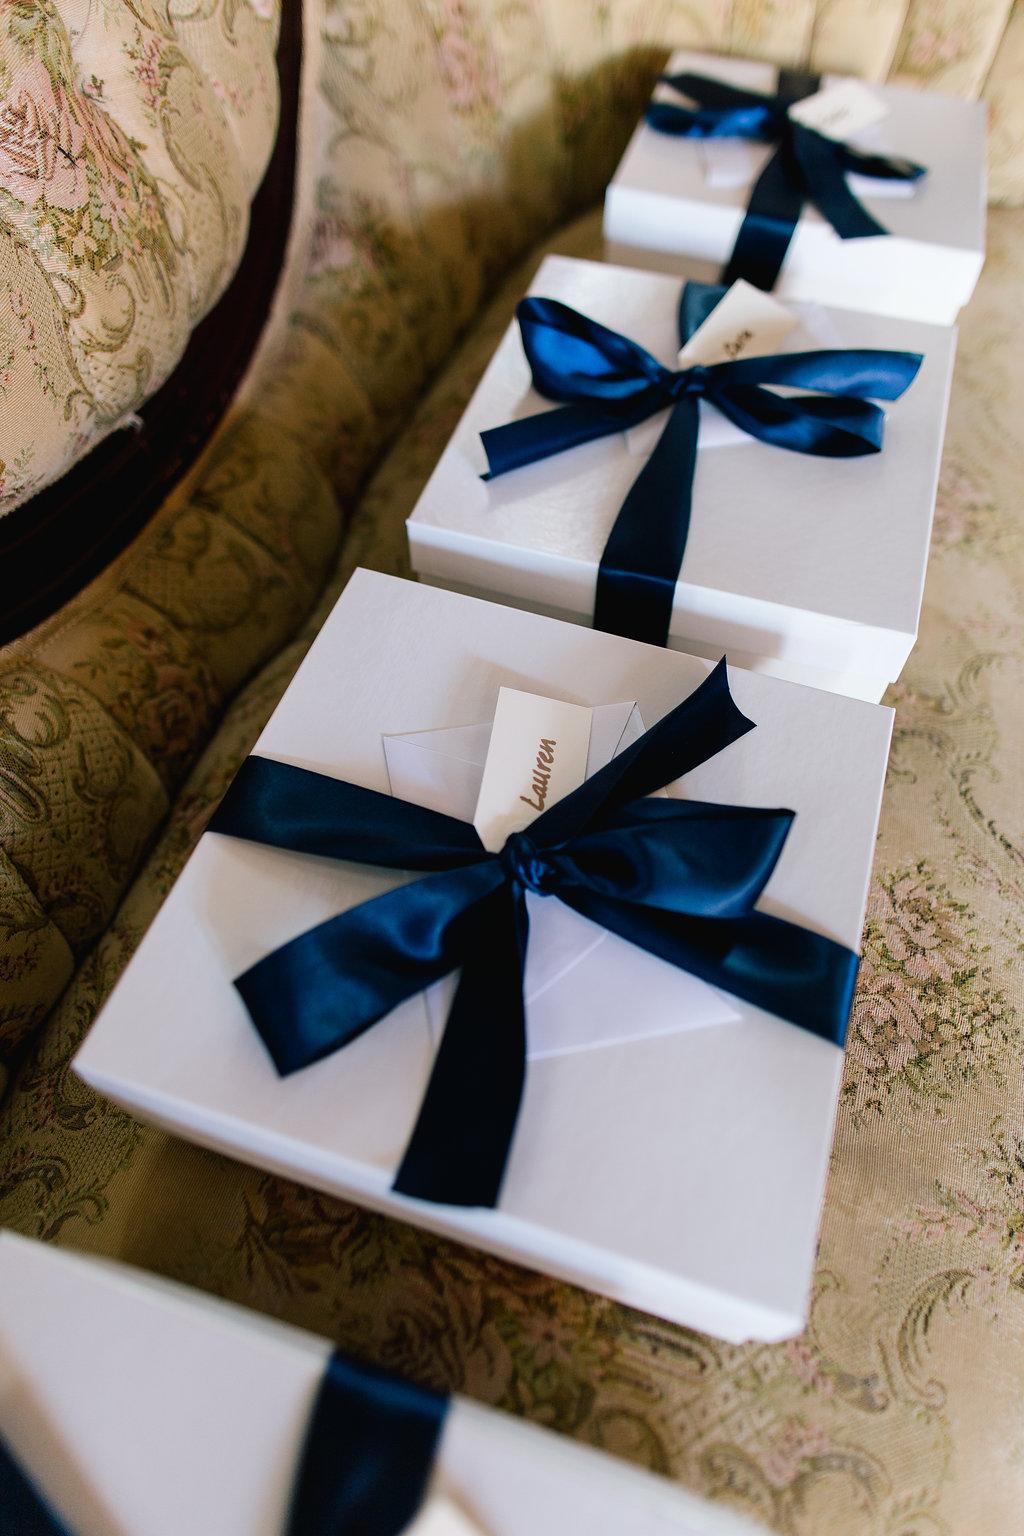 Jade + Seth Wedding | Allison Hopperstad Photography | Bloom Lake Barn | Jade Taylor Market bridesmaids boxes with blue ribbon